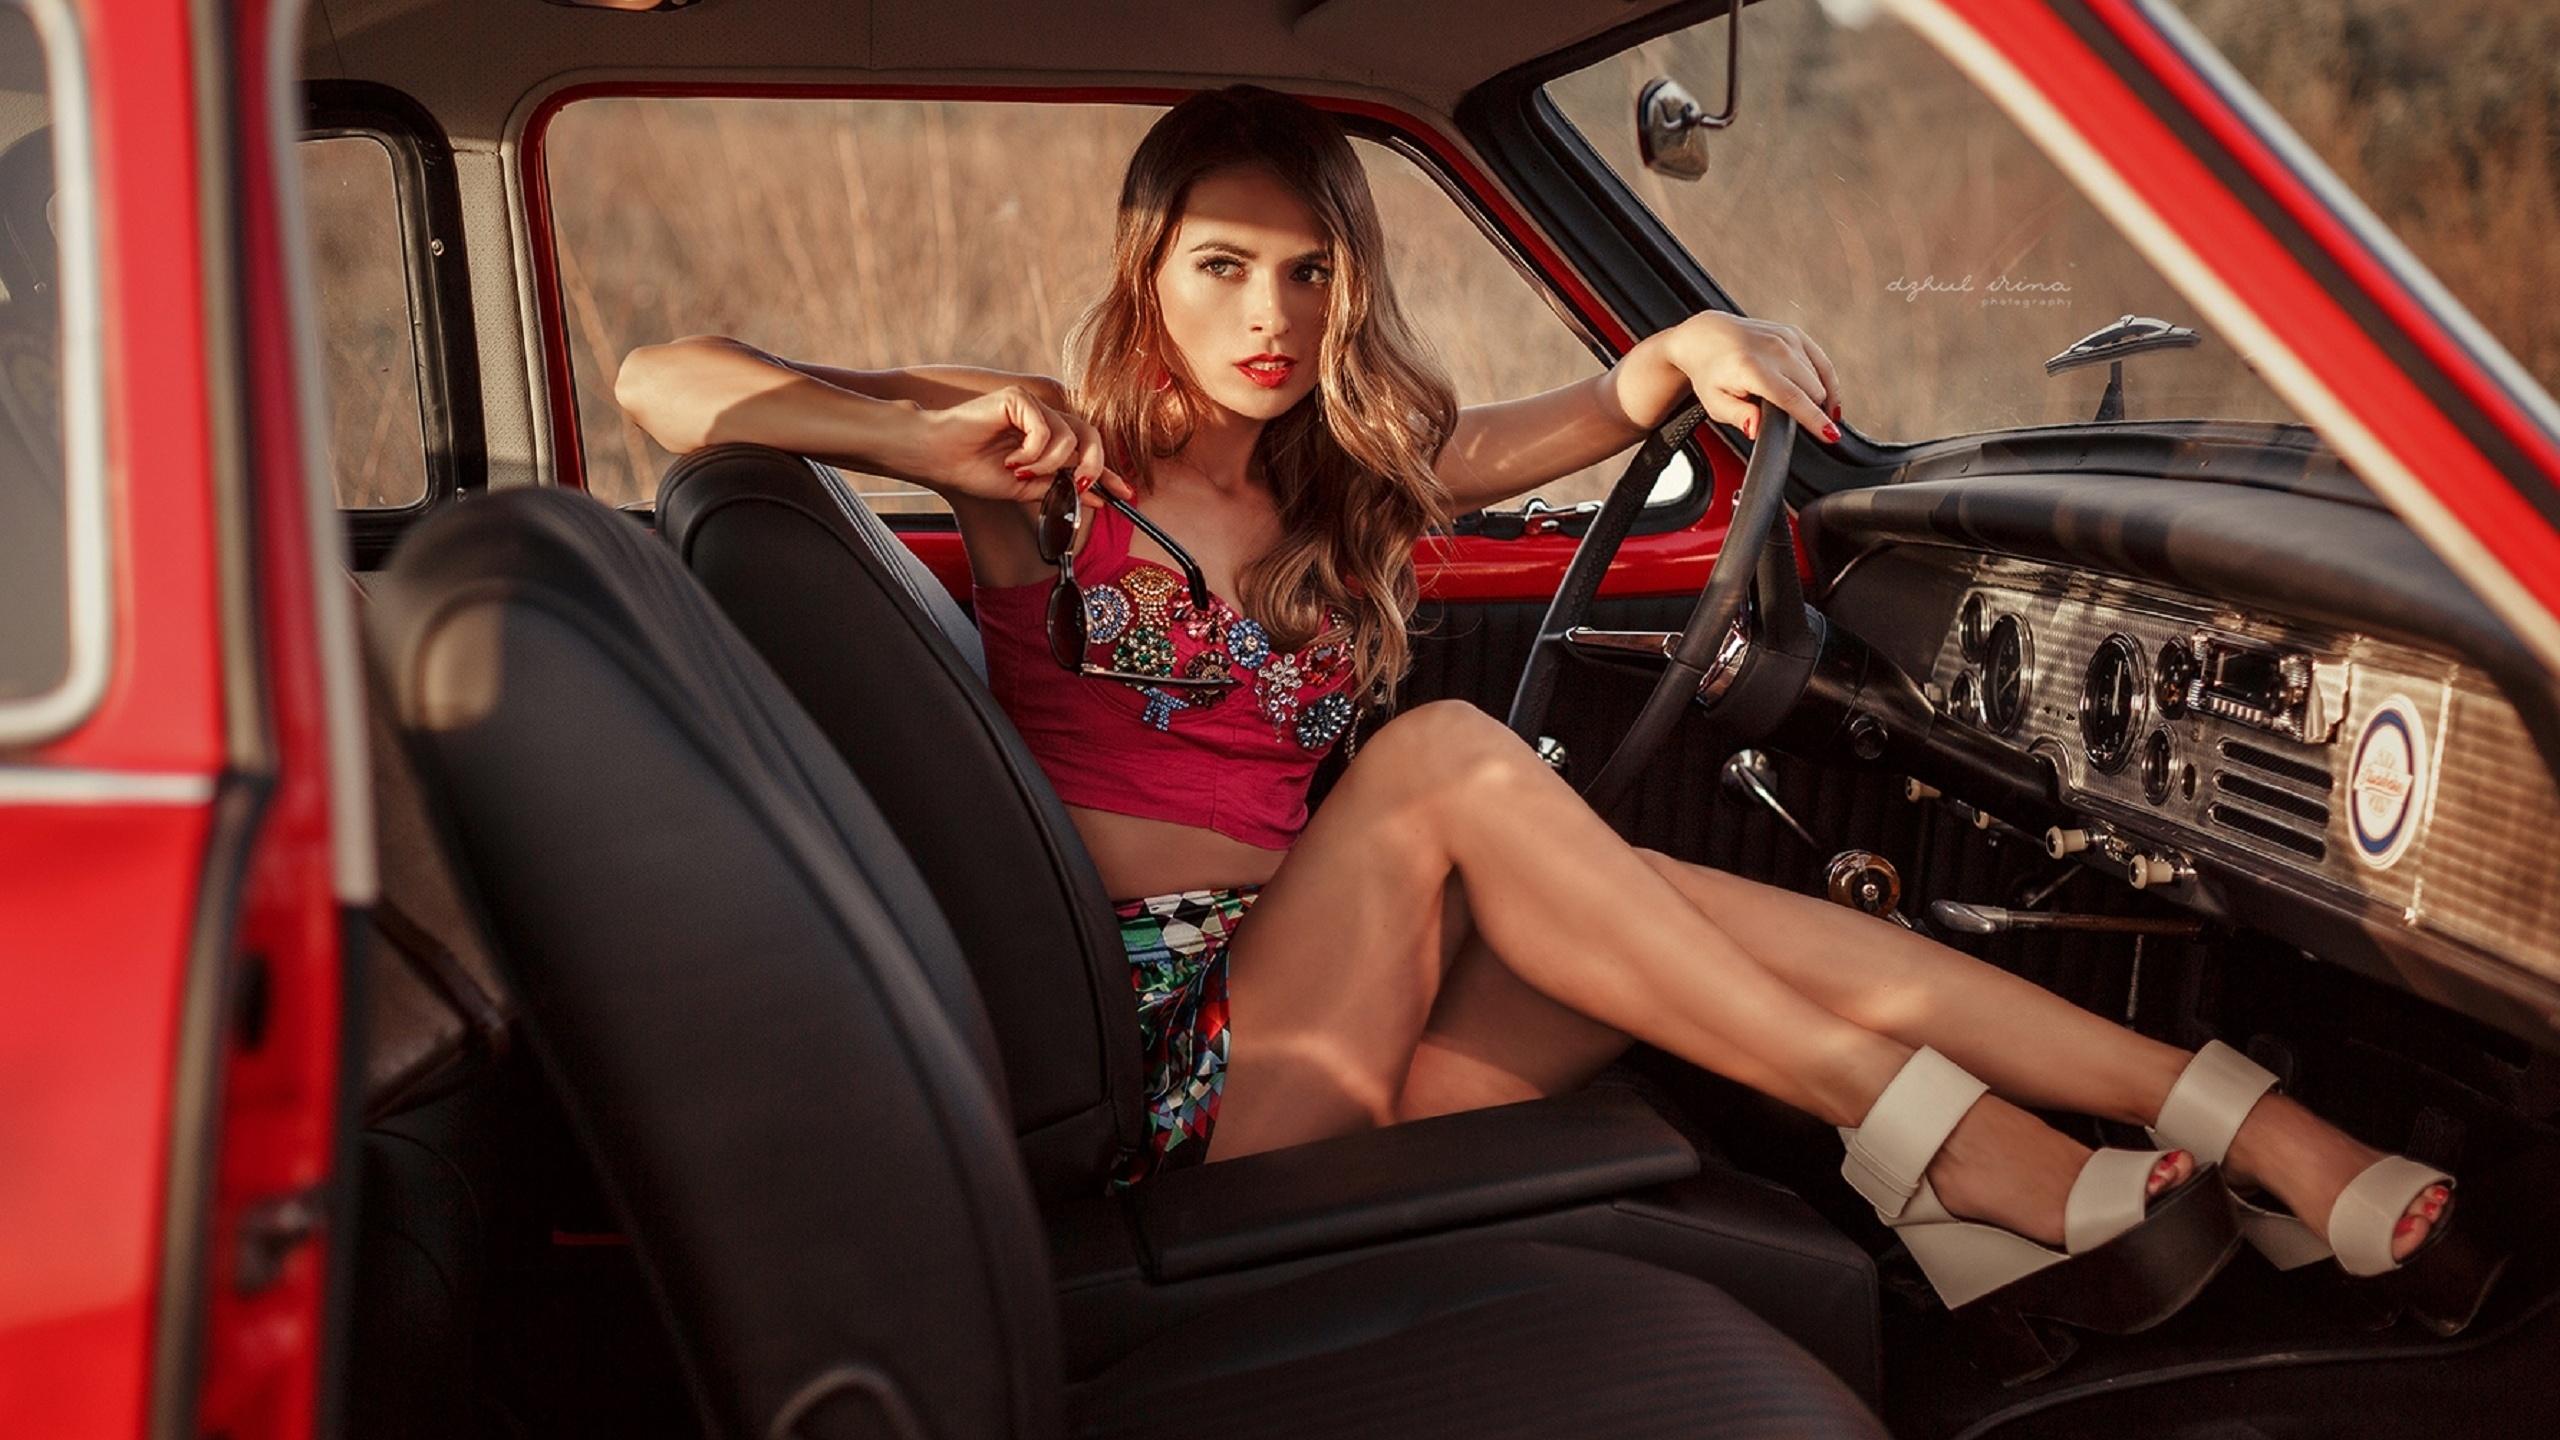 Фото манекенщиц в машинах, Модели - фото обои на рабочий стол, картинки 1 фотография